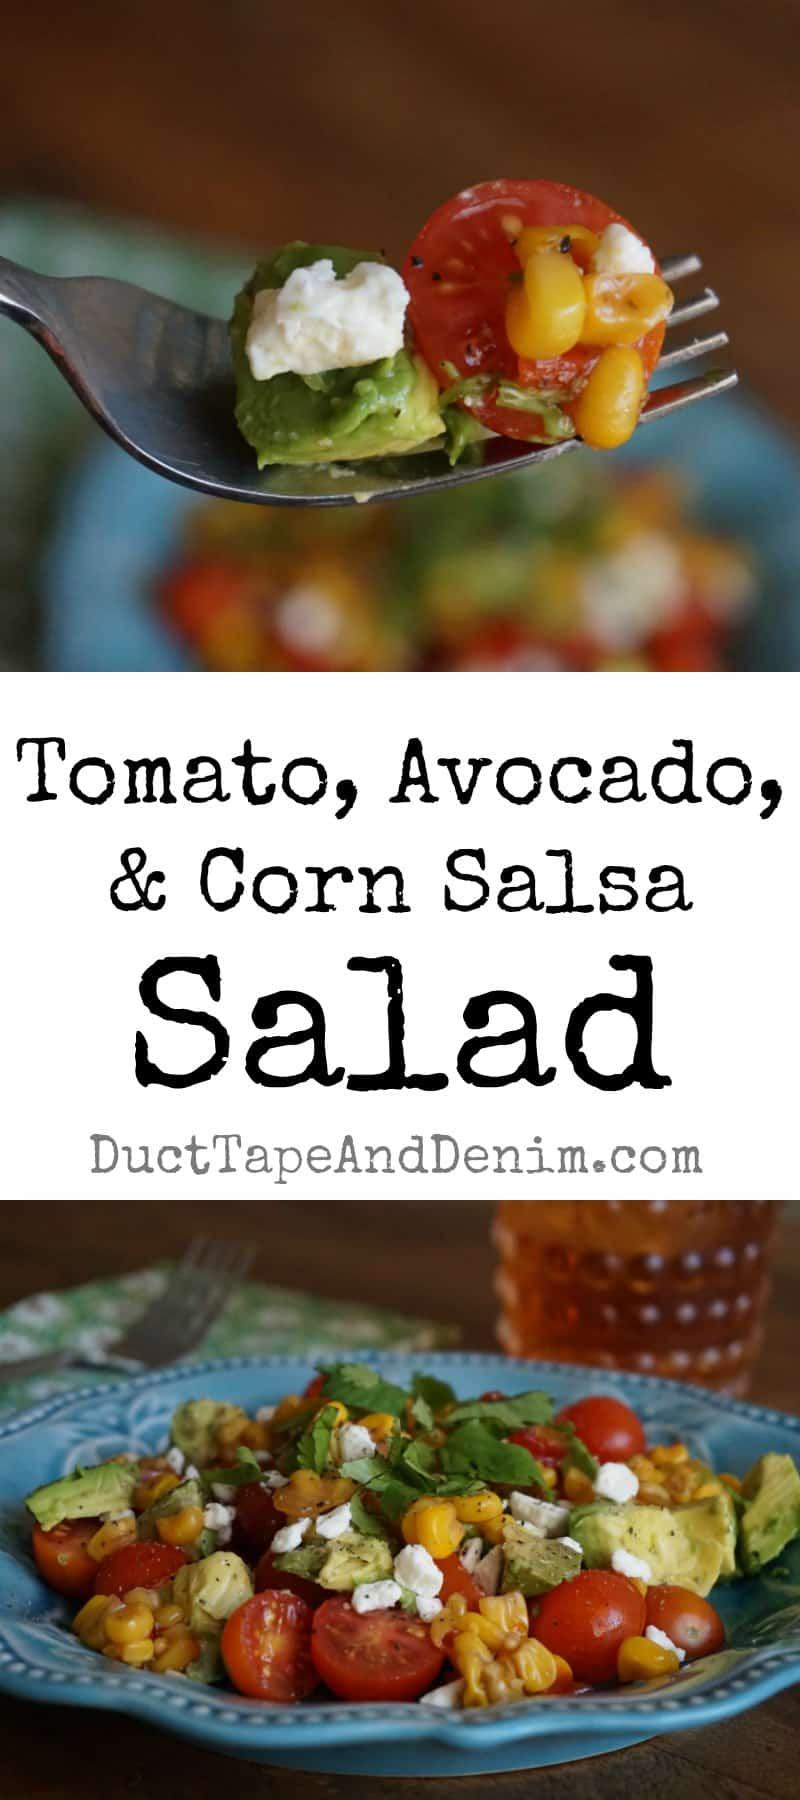 Tomato avocado and corn salsa salad recipe, Trader Joe's | DuctTapeAndDenim.com